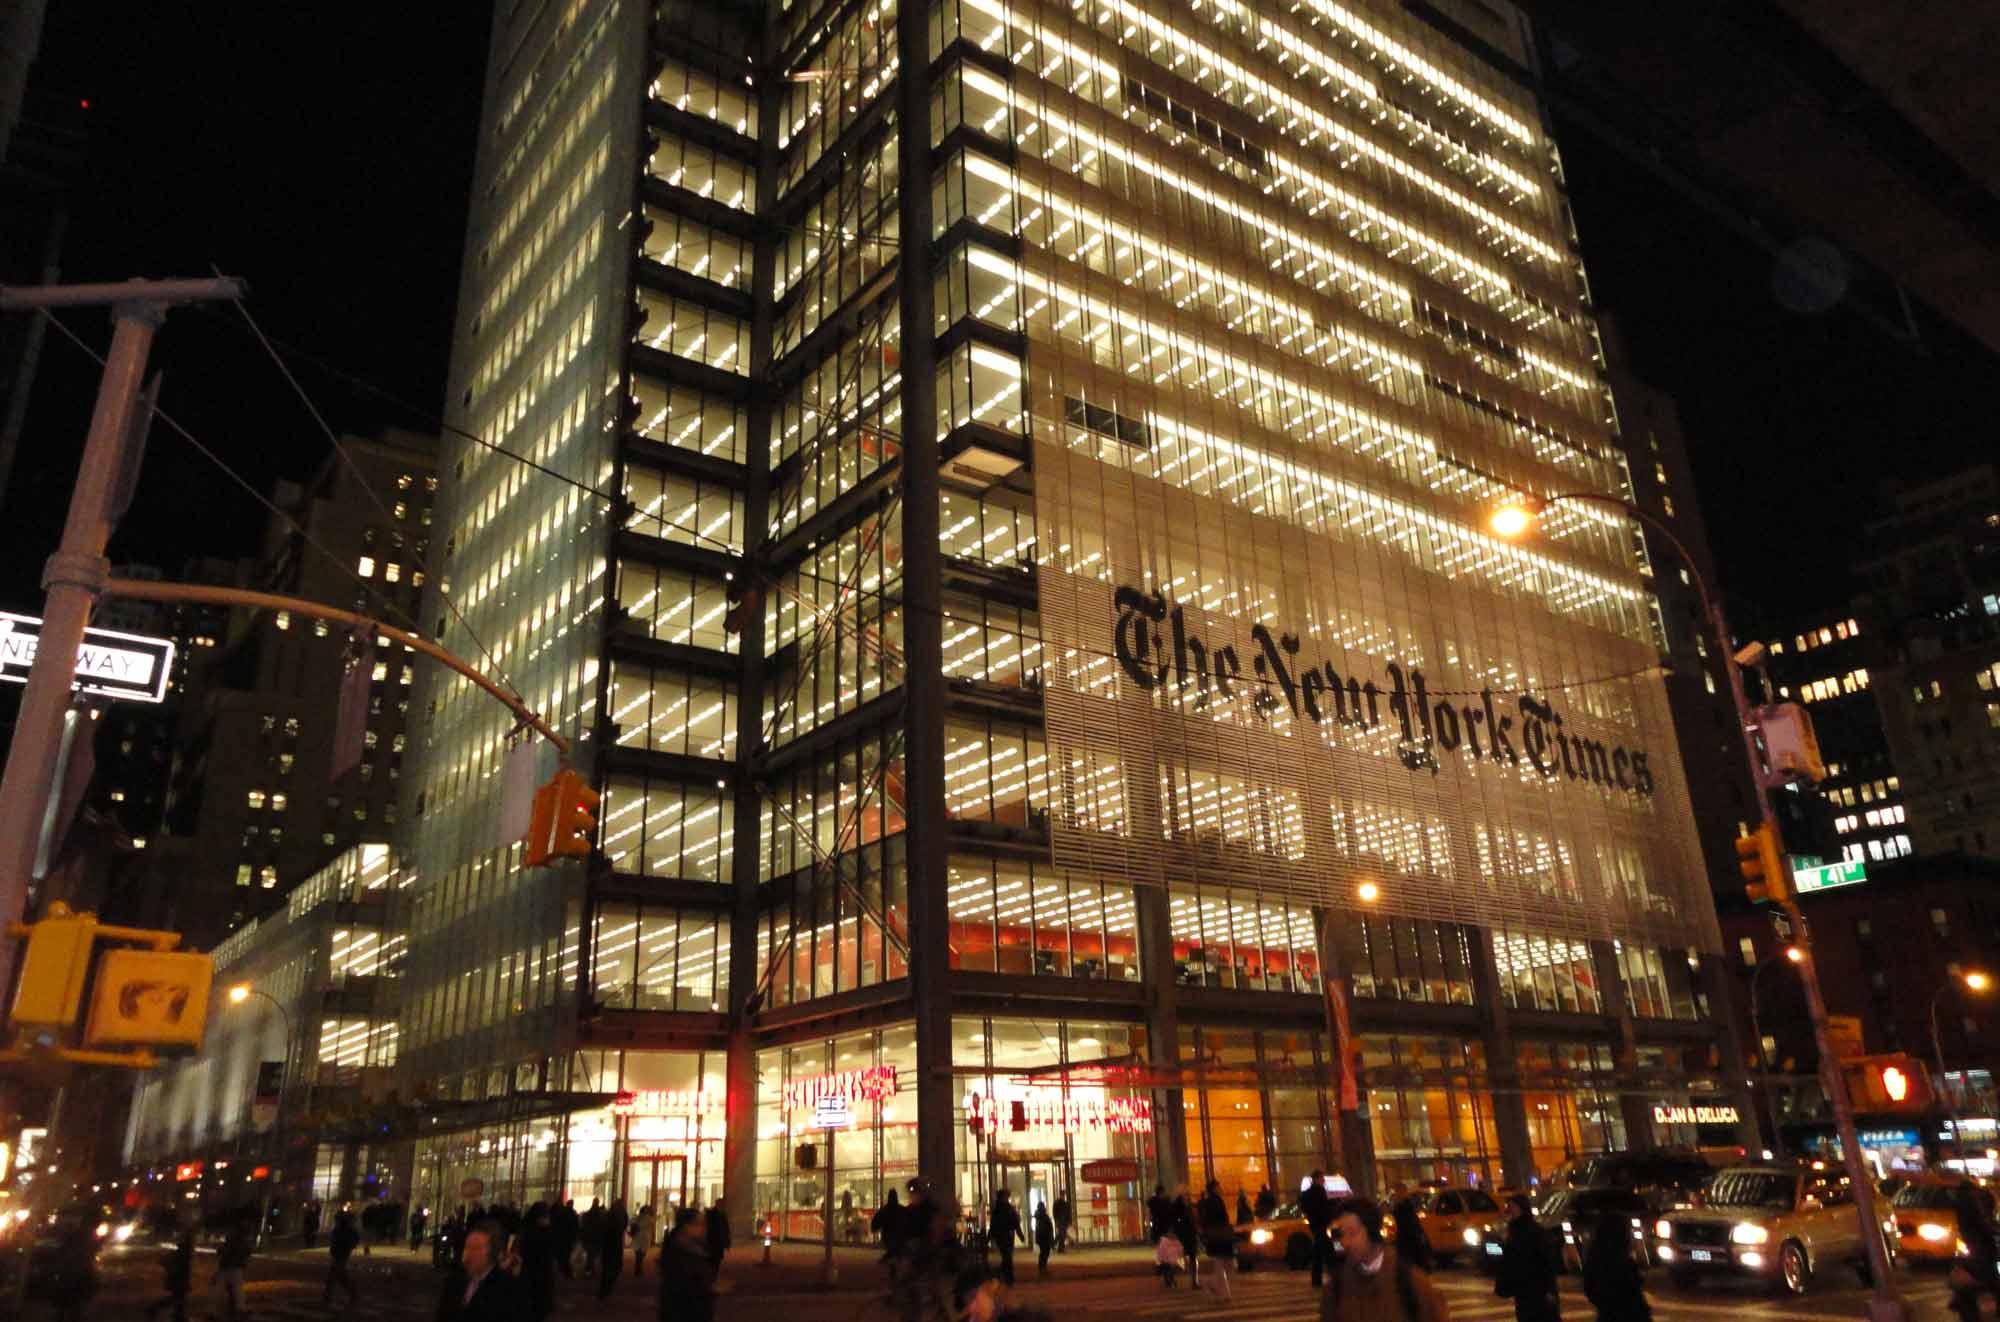 New york times bes college essays money